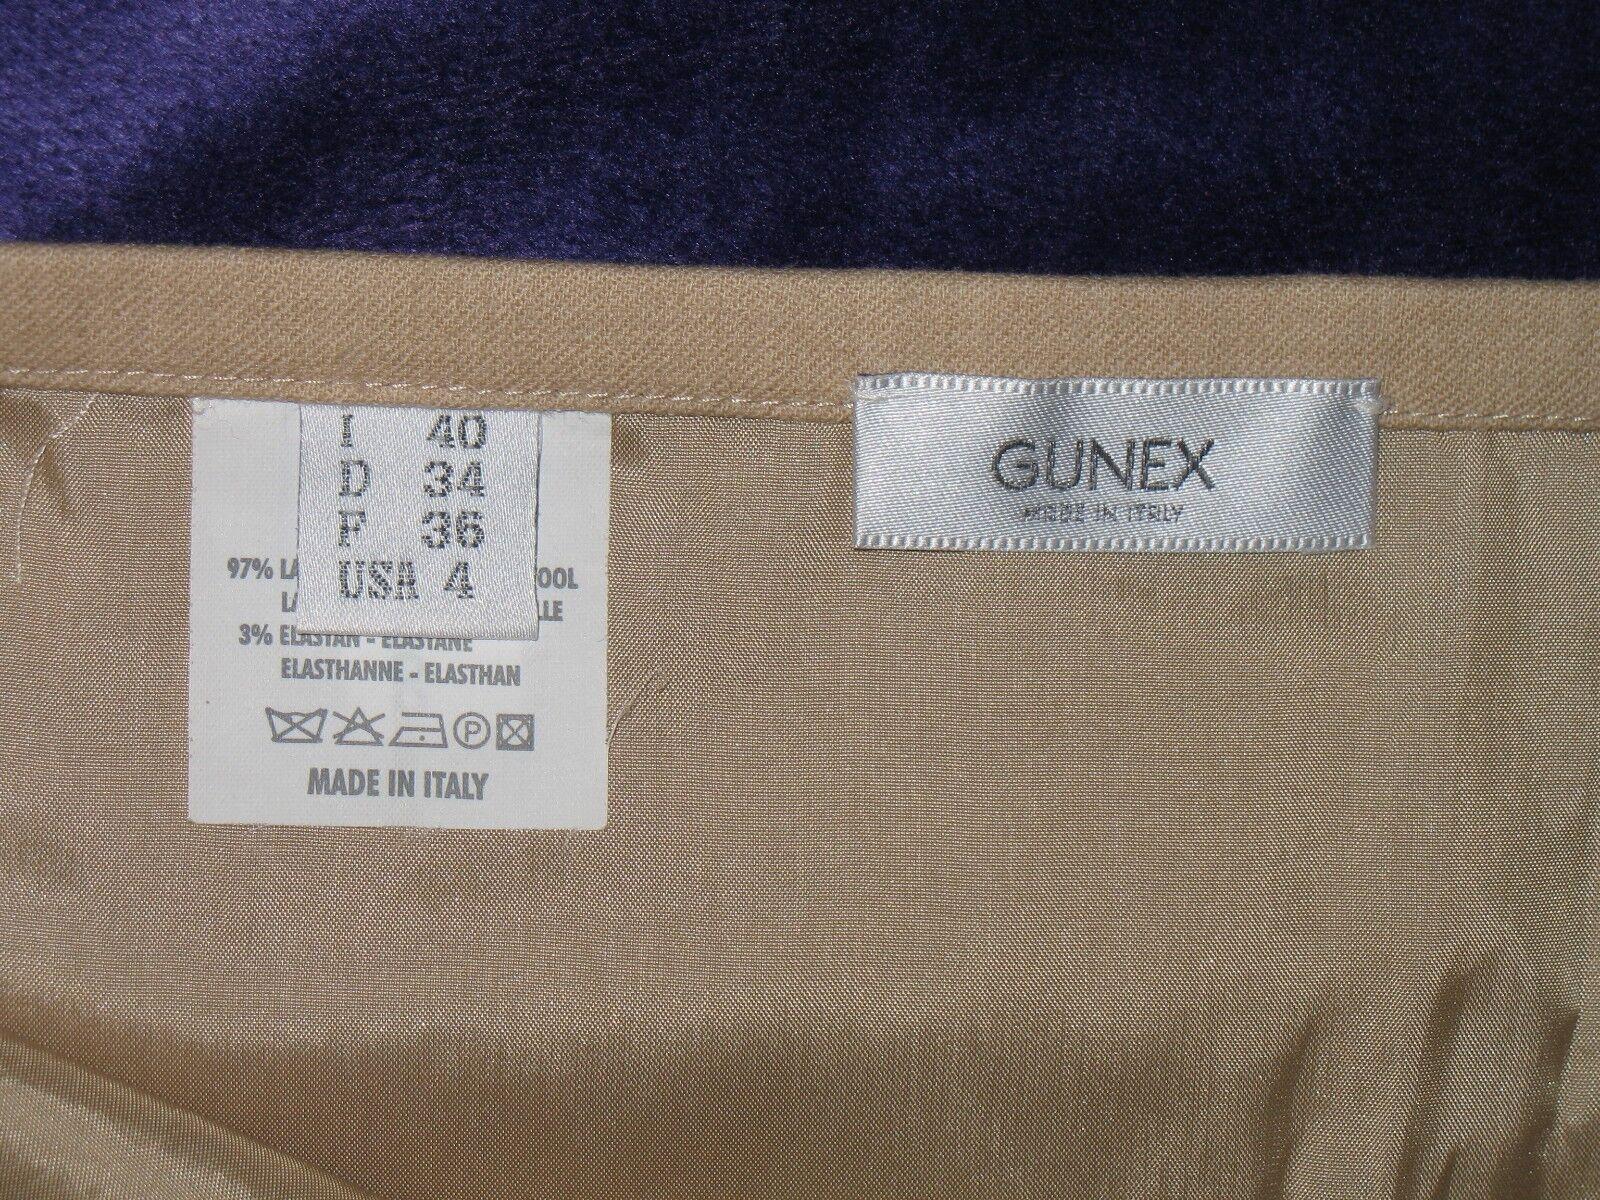 Gonna lunga beige beige beige originale Gunex (Brunello Cucinelli) lana vergine taglia 40 decbce